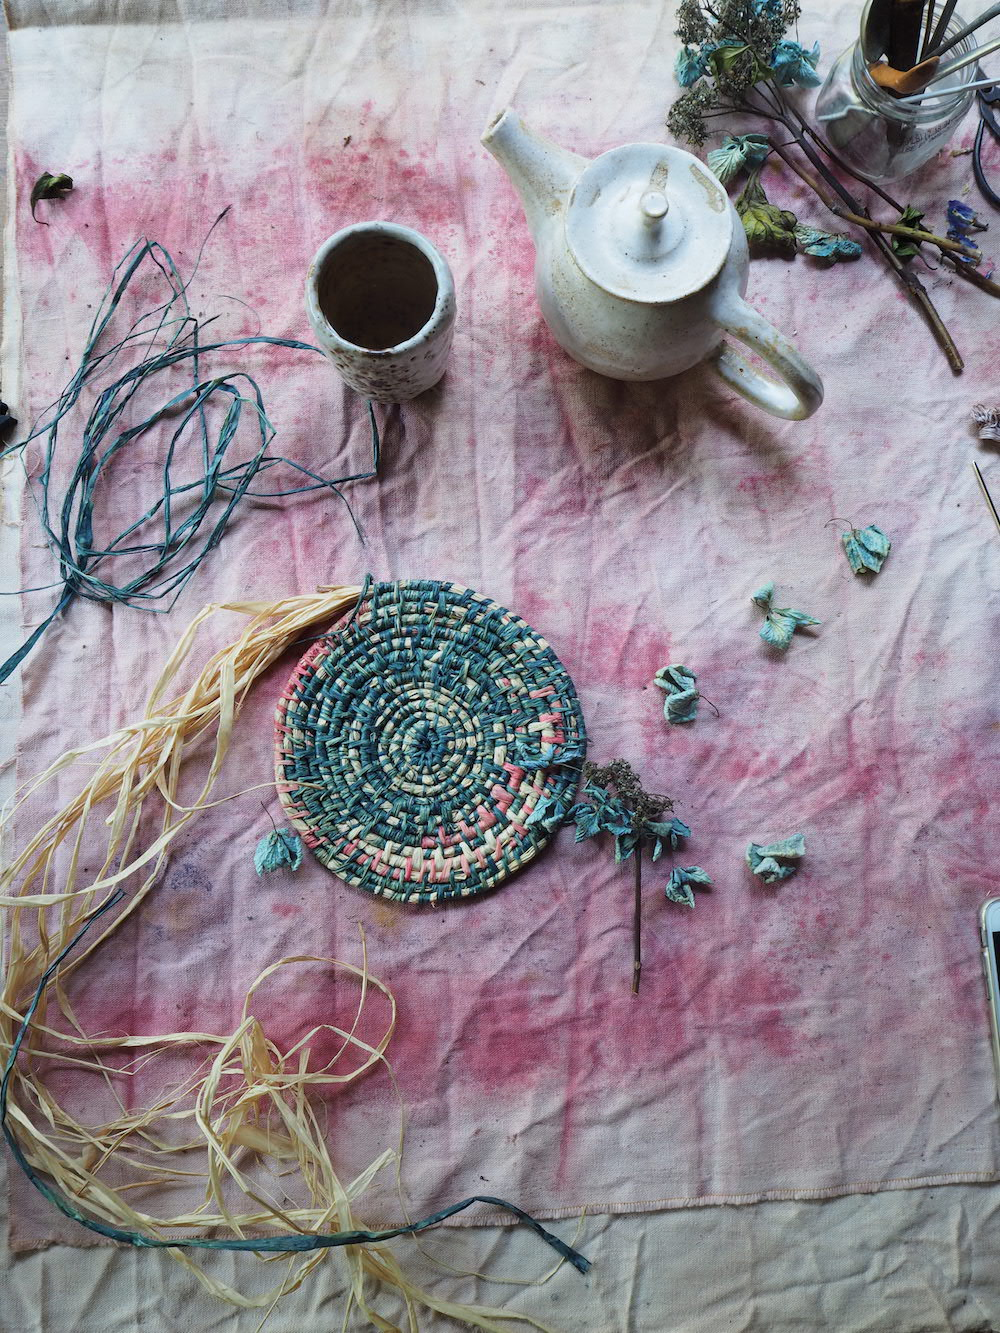 Ellie Beck Petalplum Basket weaving and pink table cloth.JPG